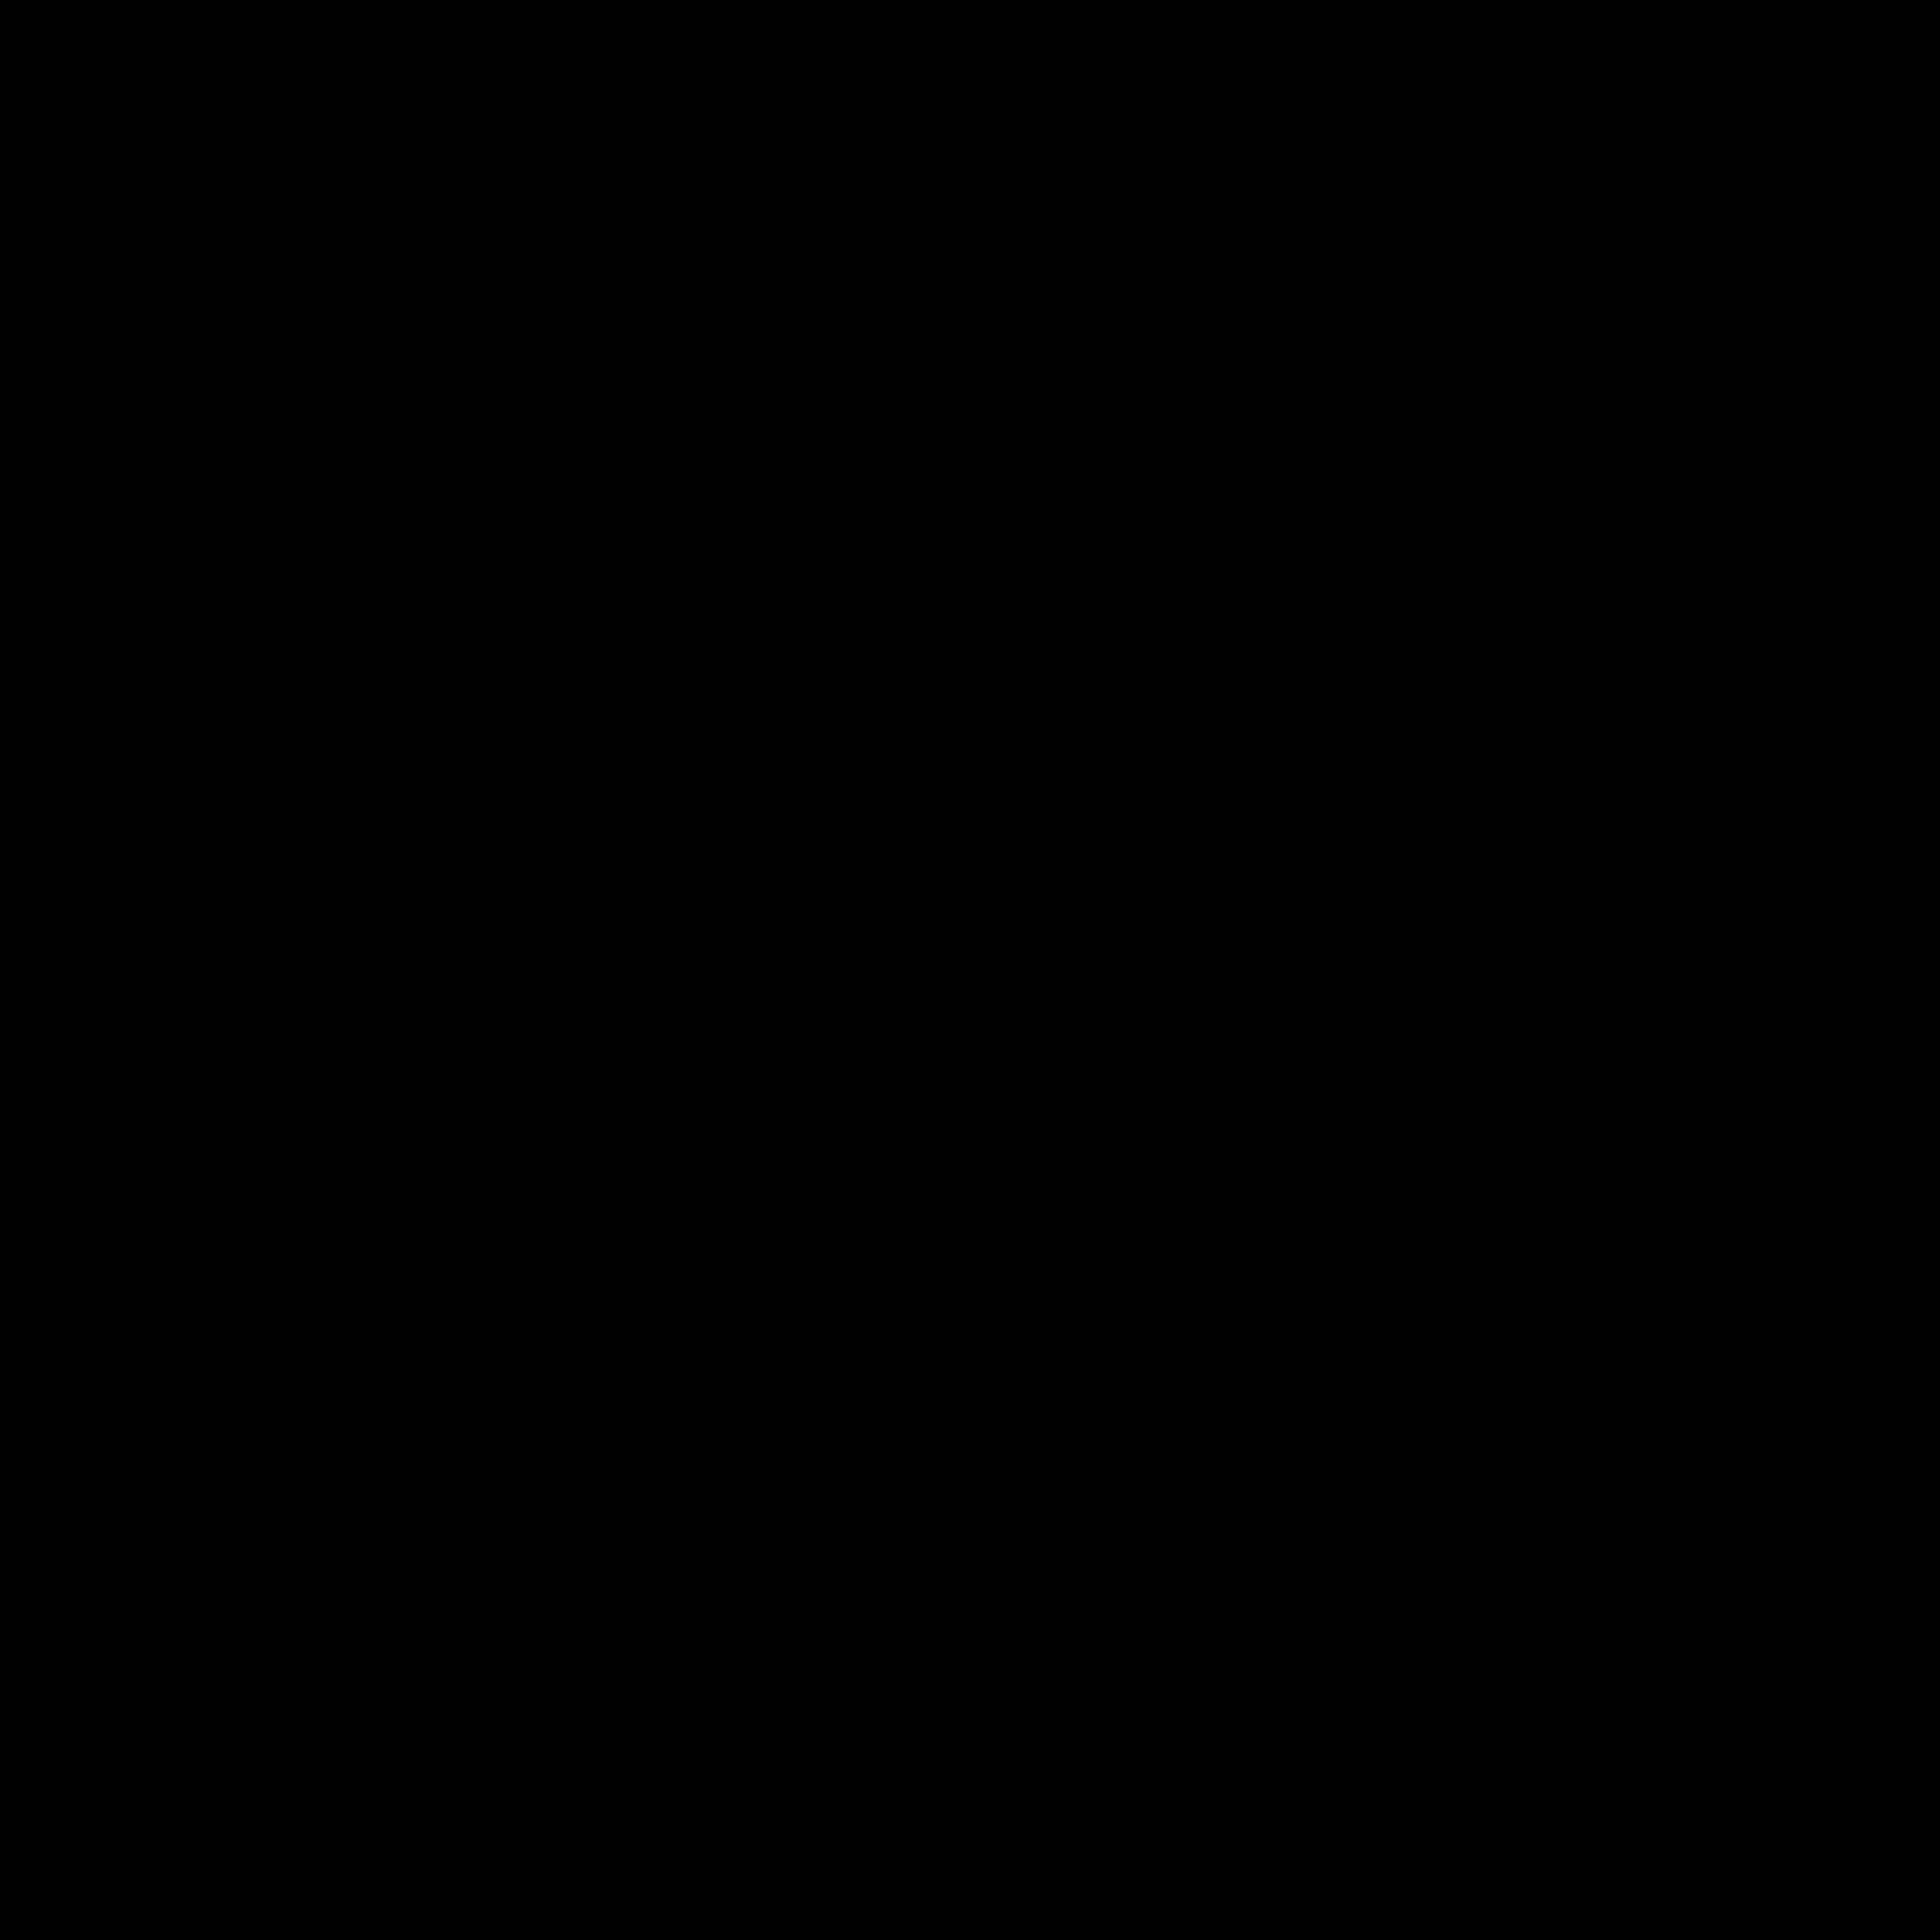 panerai logo 0 - Panerai Logo